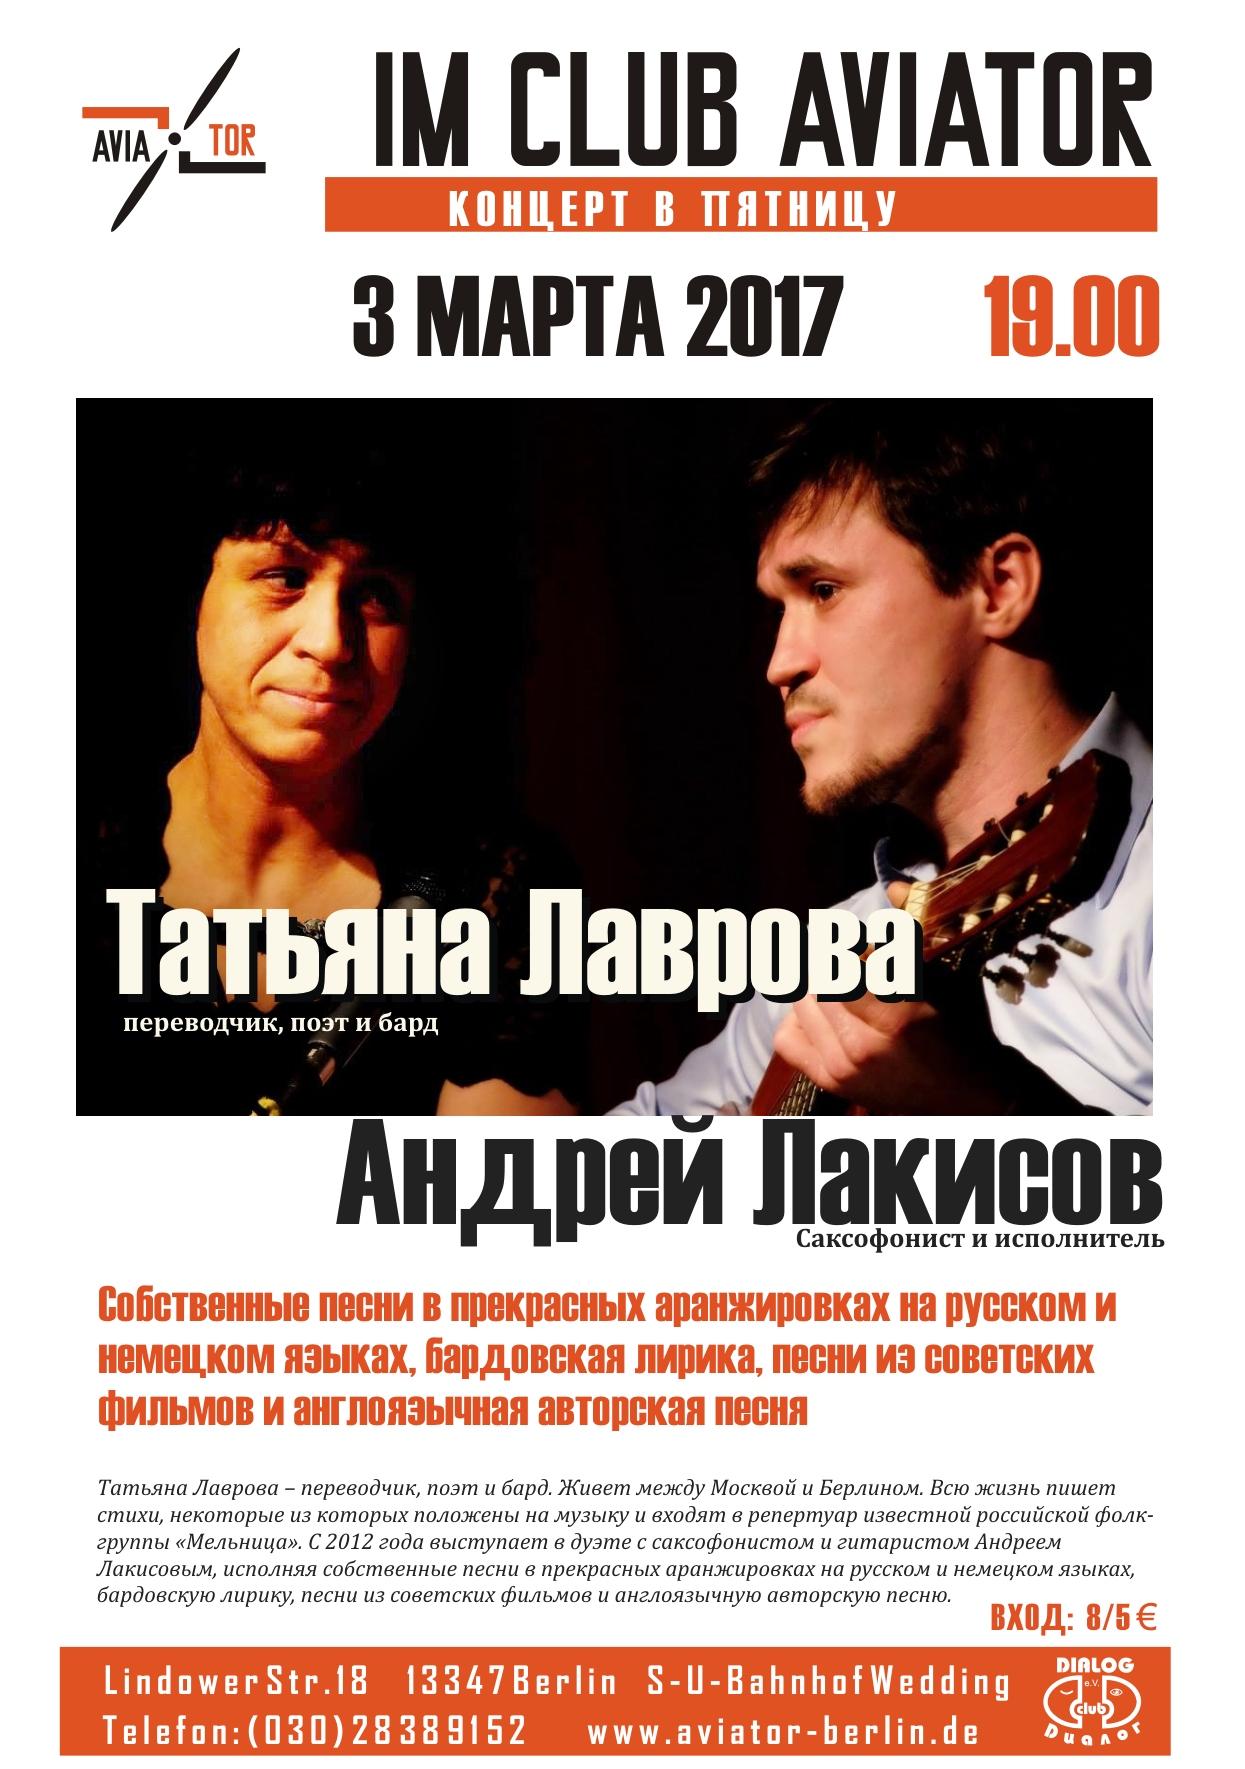 plakat lakisov lavrova ru web